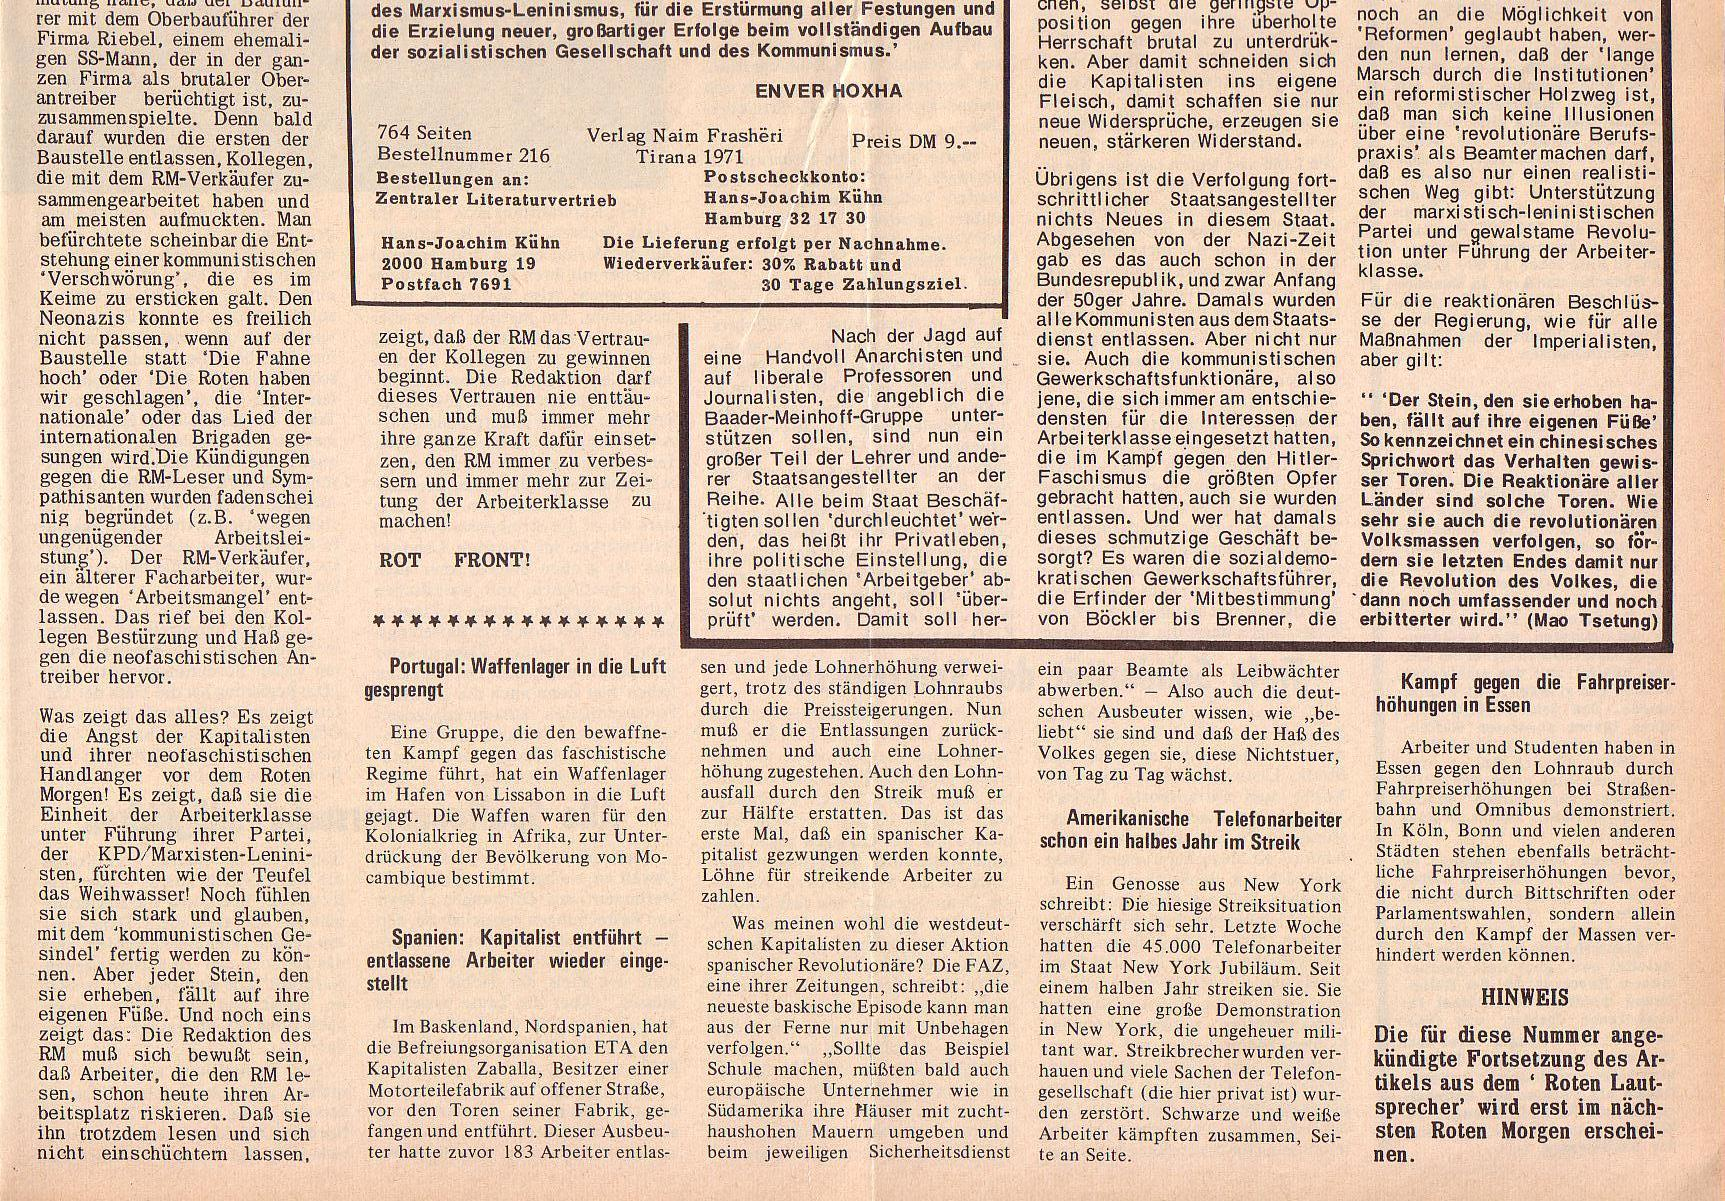 Roter Morgen, 6. Jg., 14. Februar 1972, Nr. 4, Seite 3b